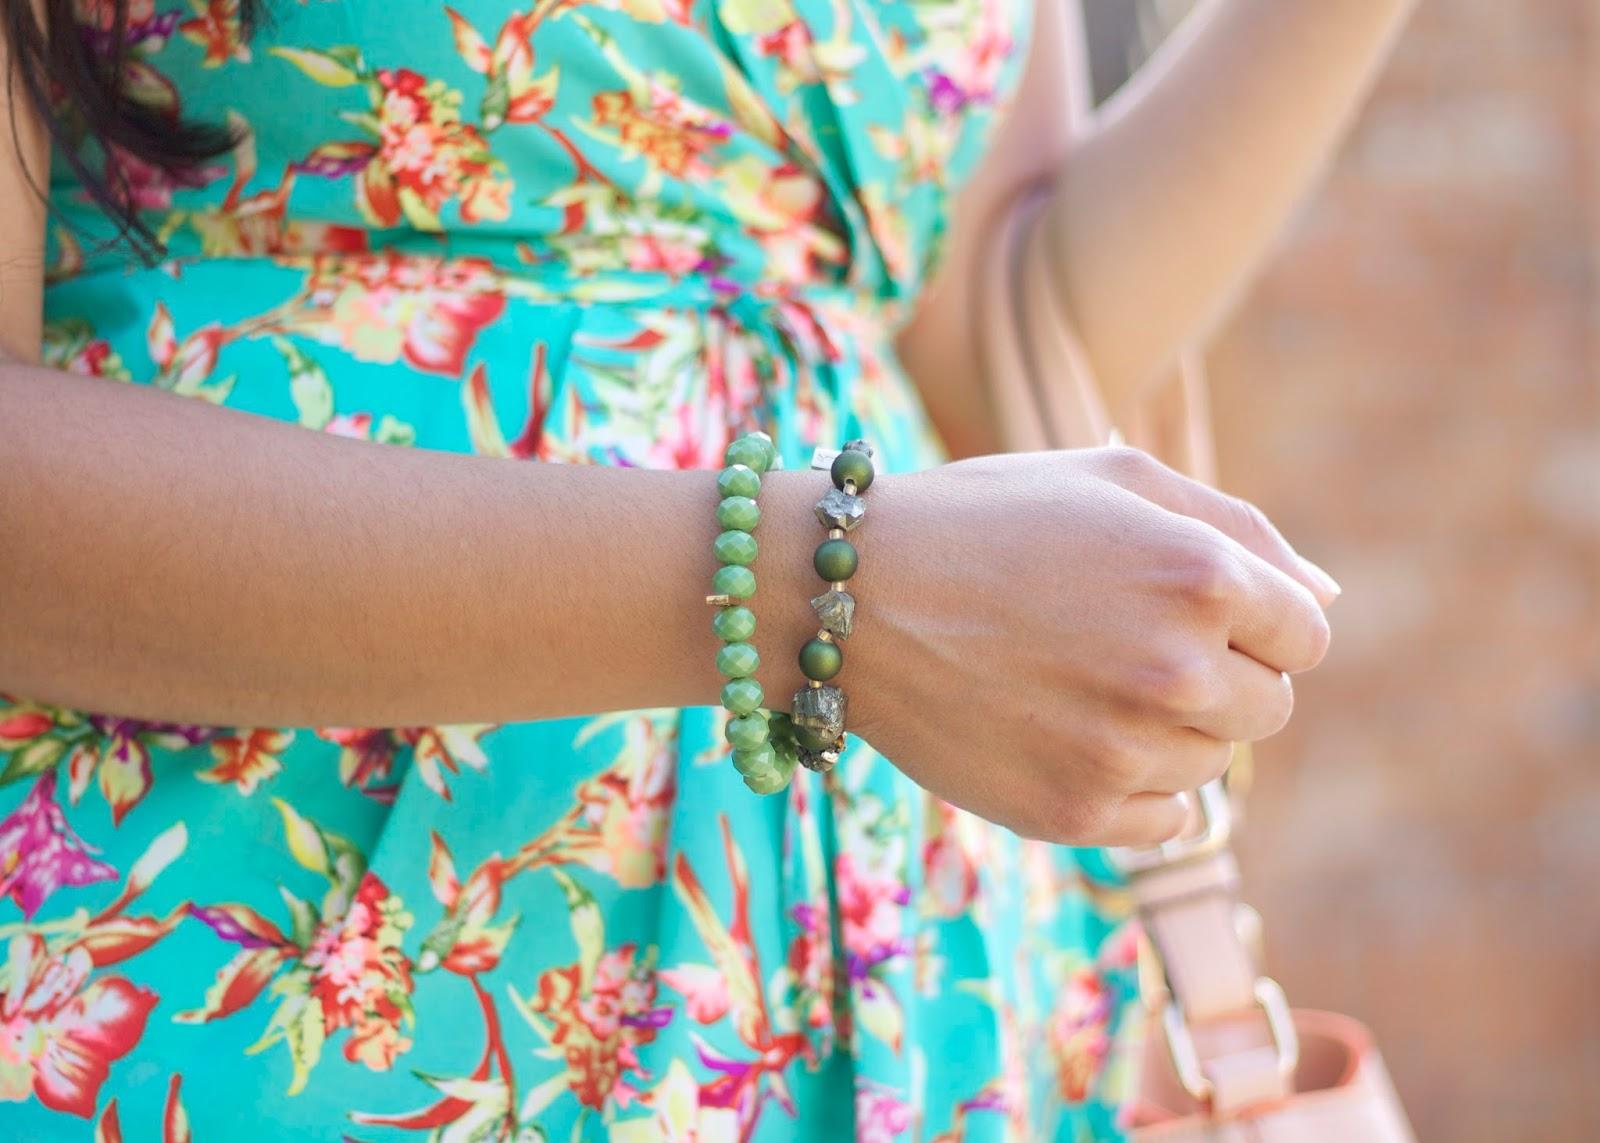 Ziur Design bracelets, jewelry designers in San Diego, San Diego's best jewelry Ziur, Ziur designs on San Diego blogger